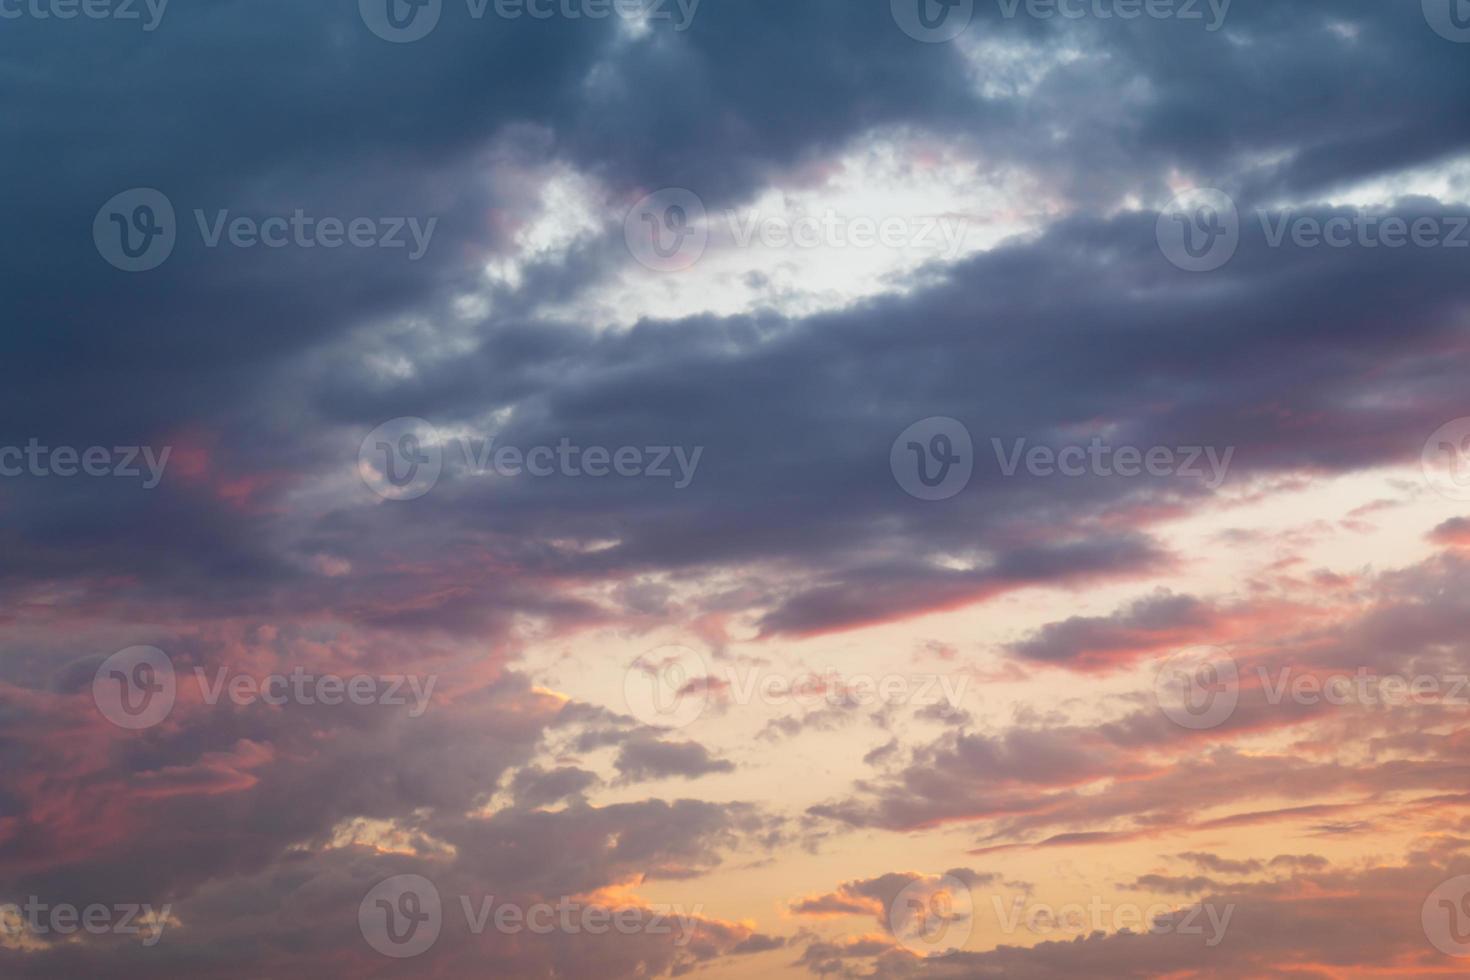 bewolkte hemel bij zonsondergang achtergrond foto